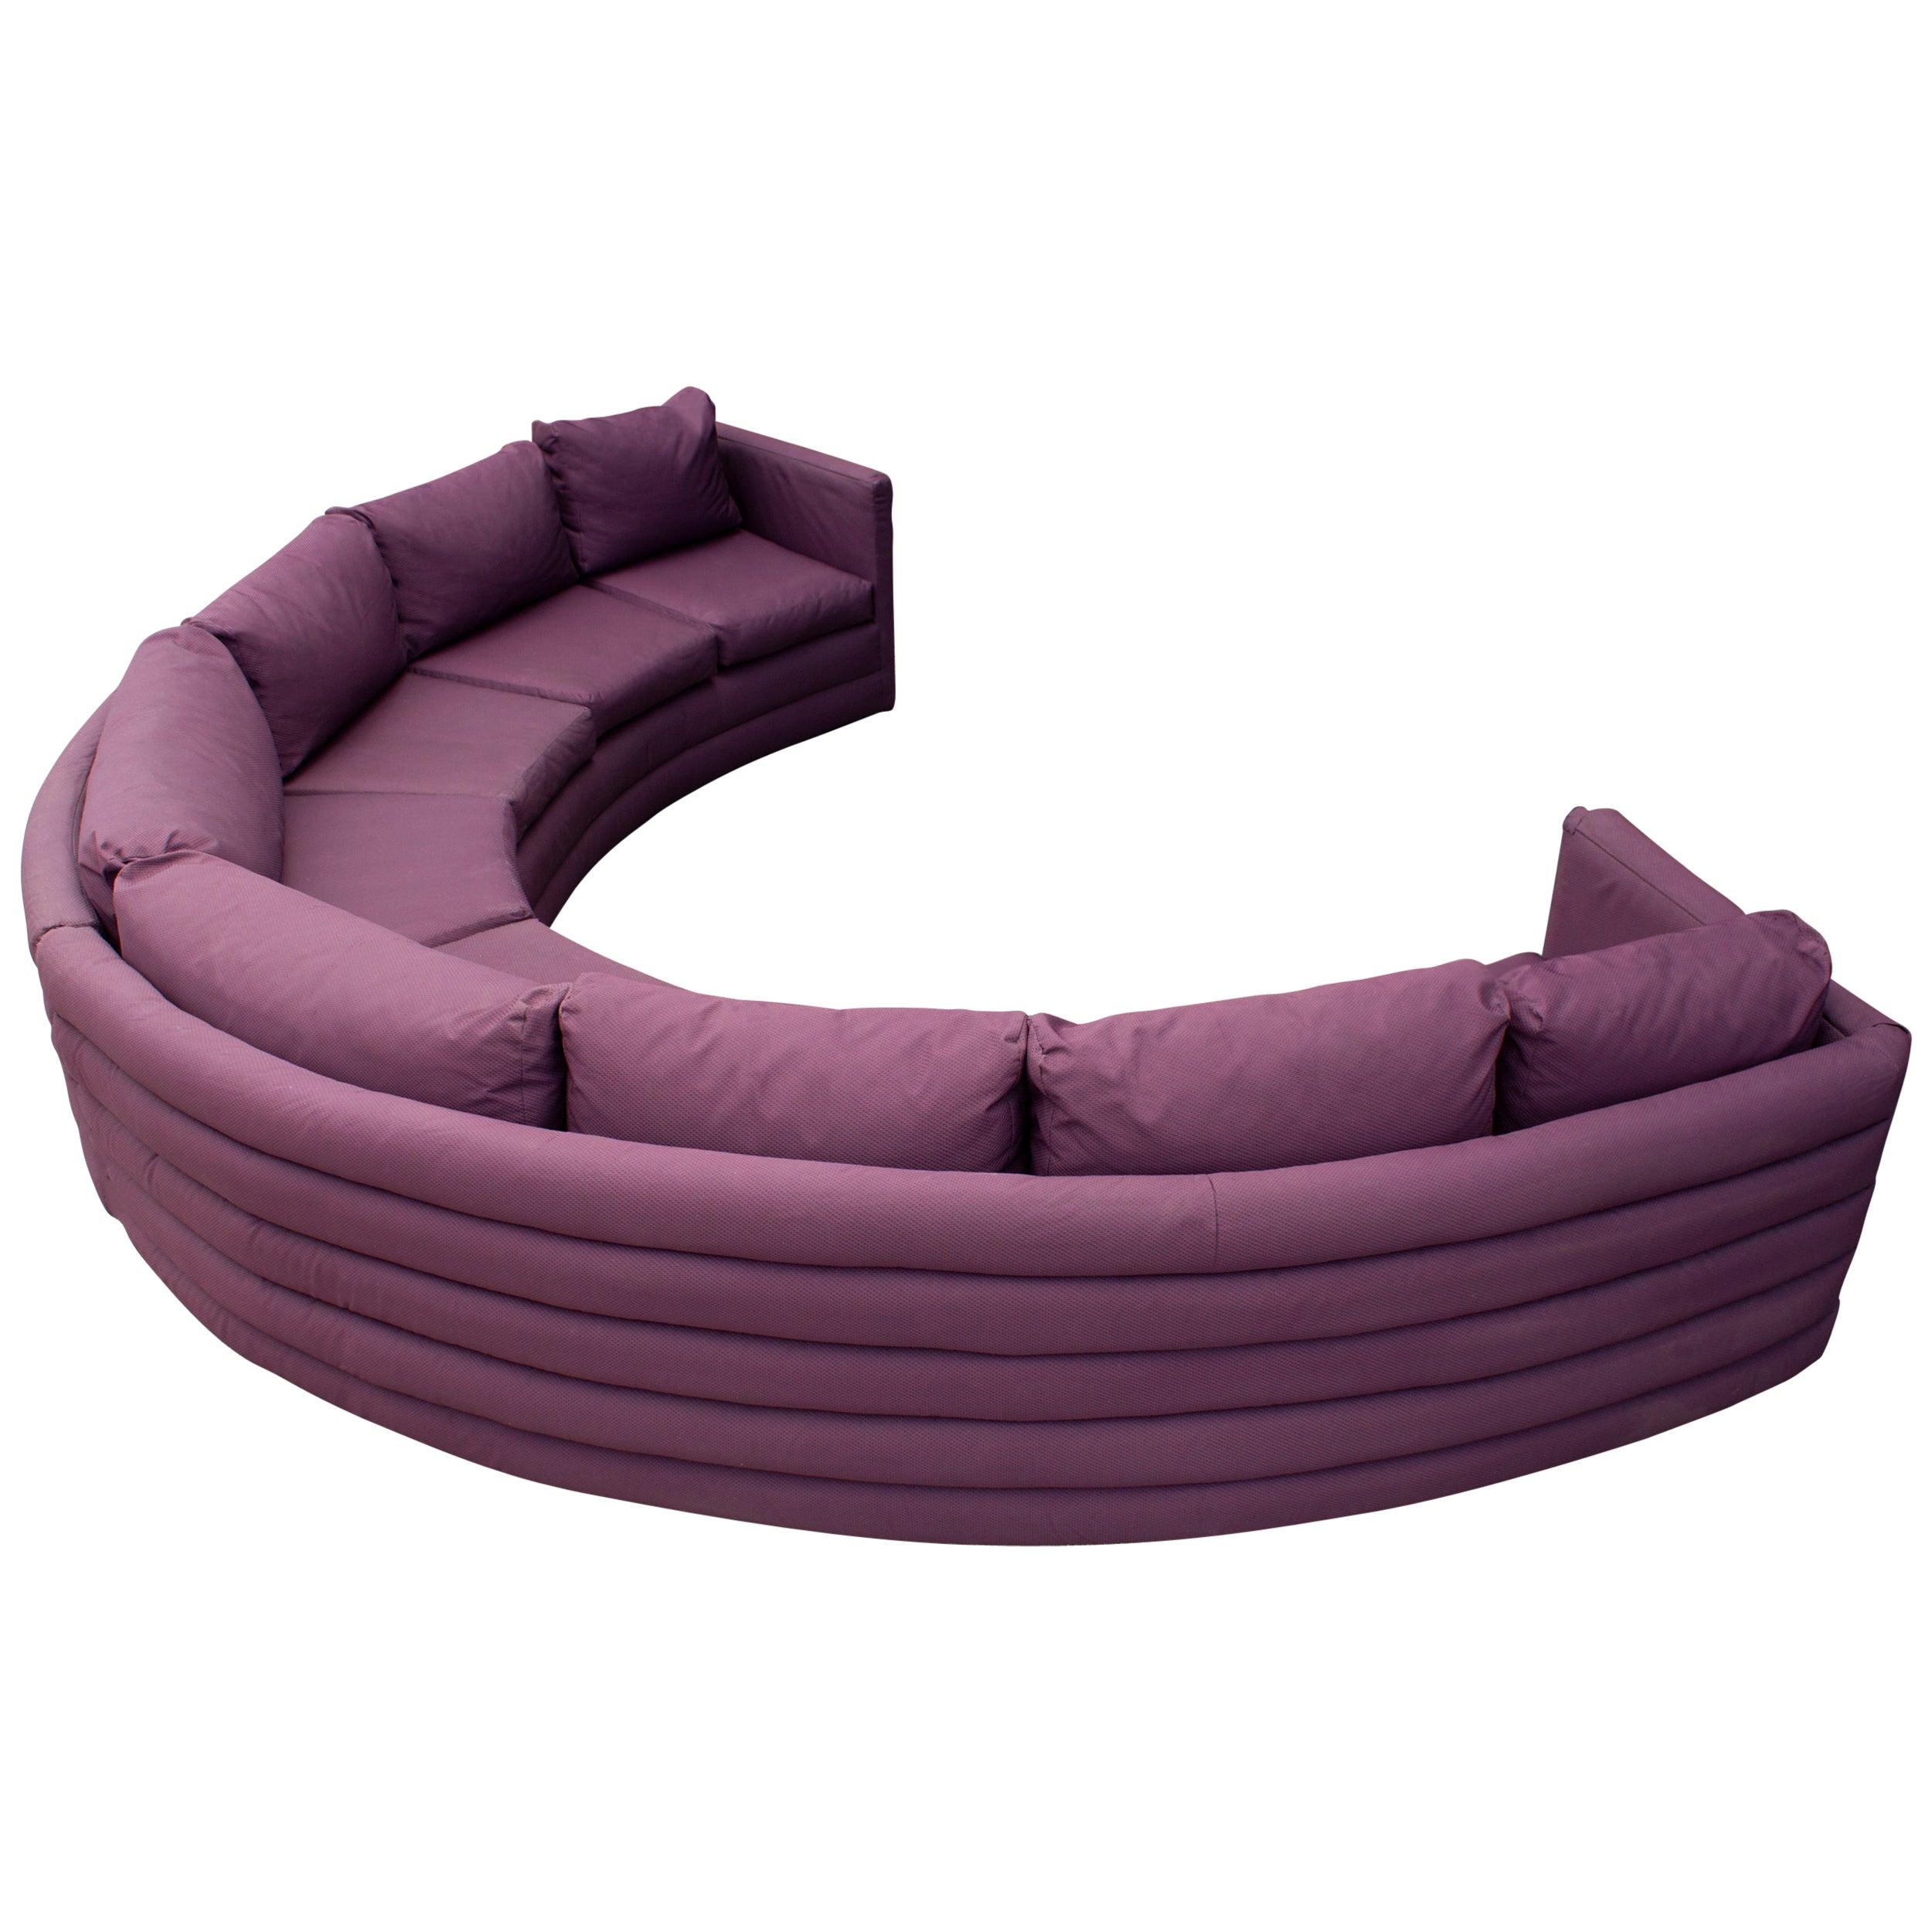 Milo Baughman For Thayer Coggin 1970s Channel Back Semi-Circular Sectional Sofa